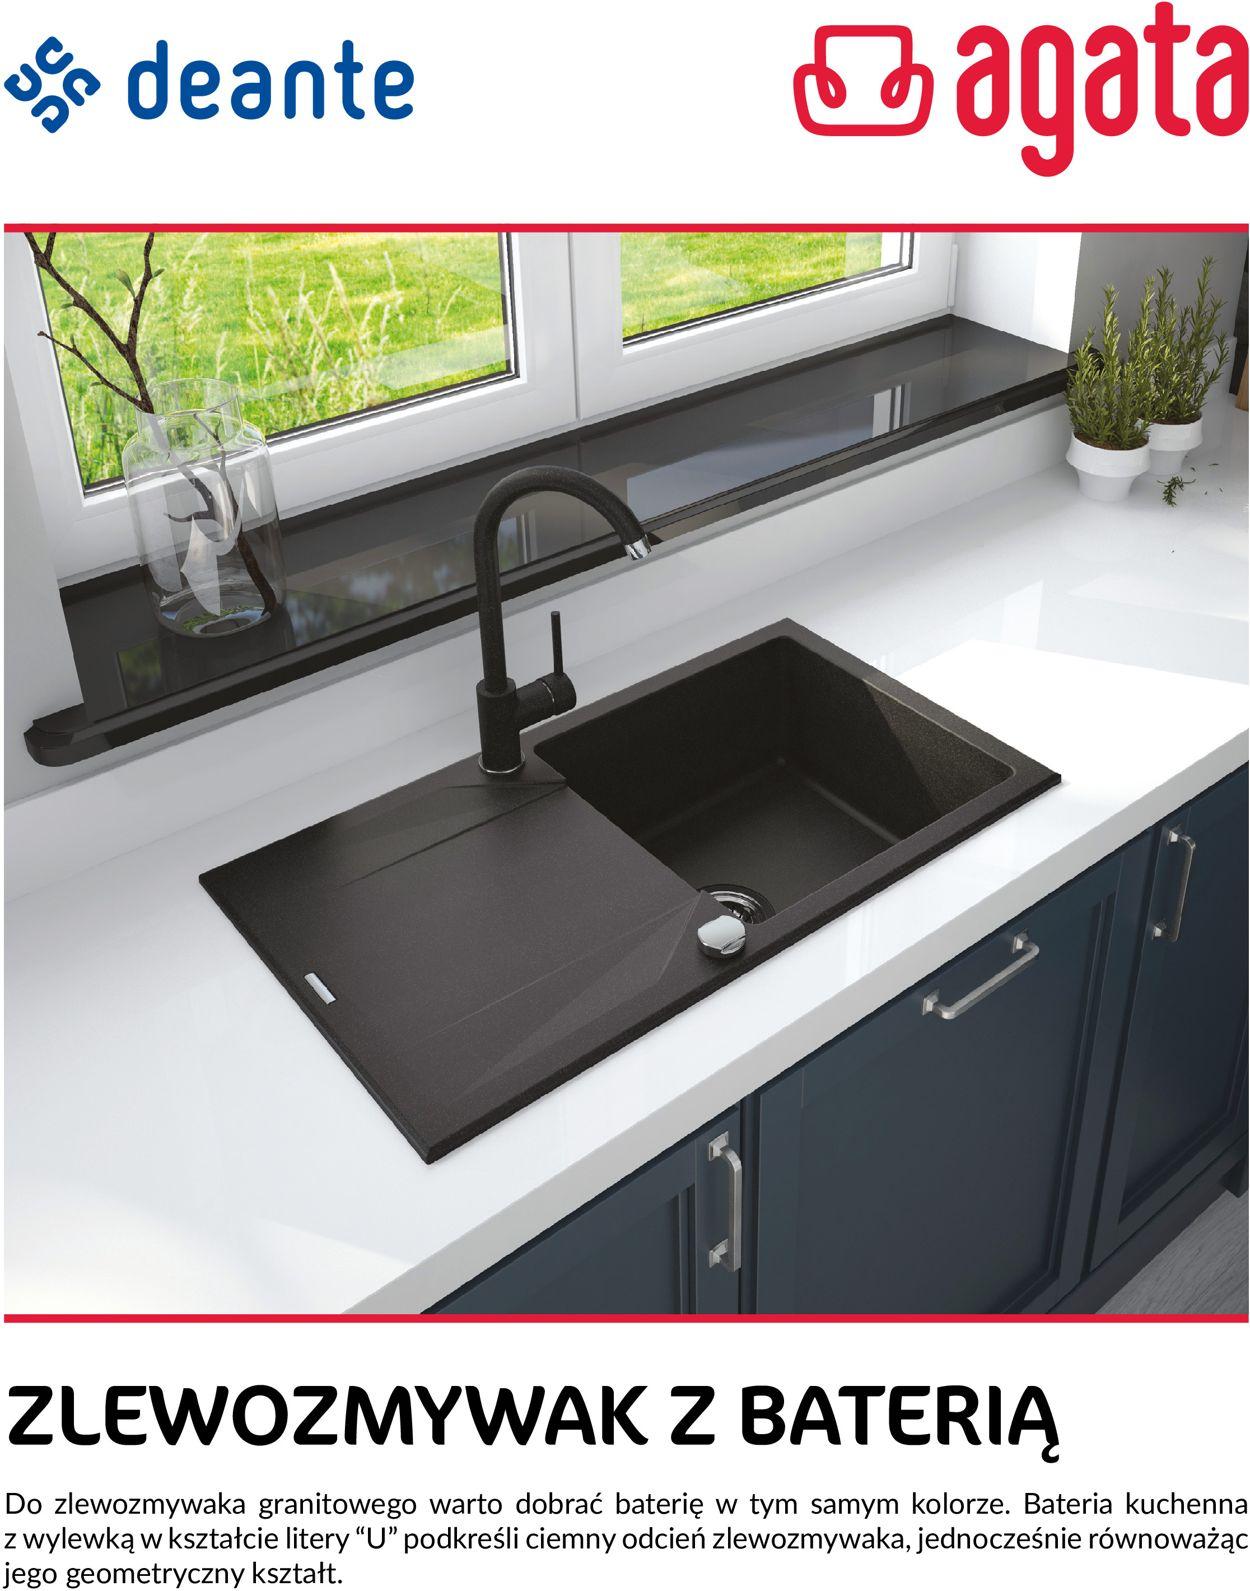 Gazetka promocyjna Agata Meble - 31.01-31.12.2021